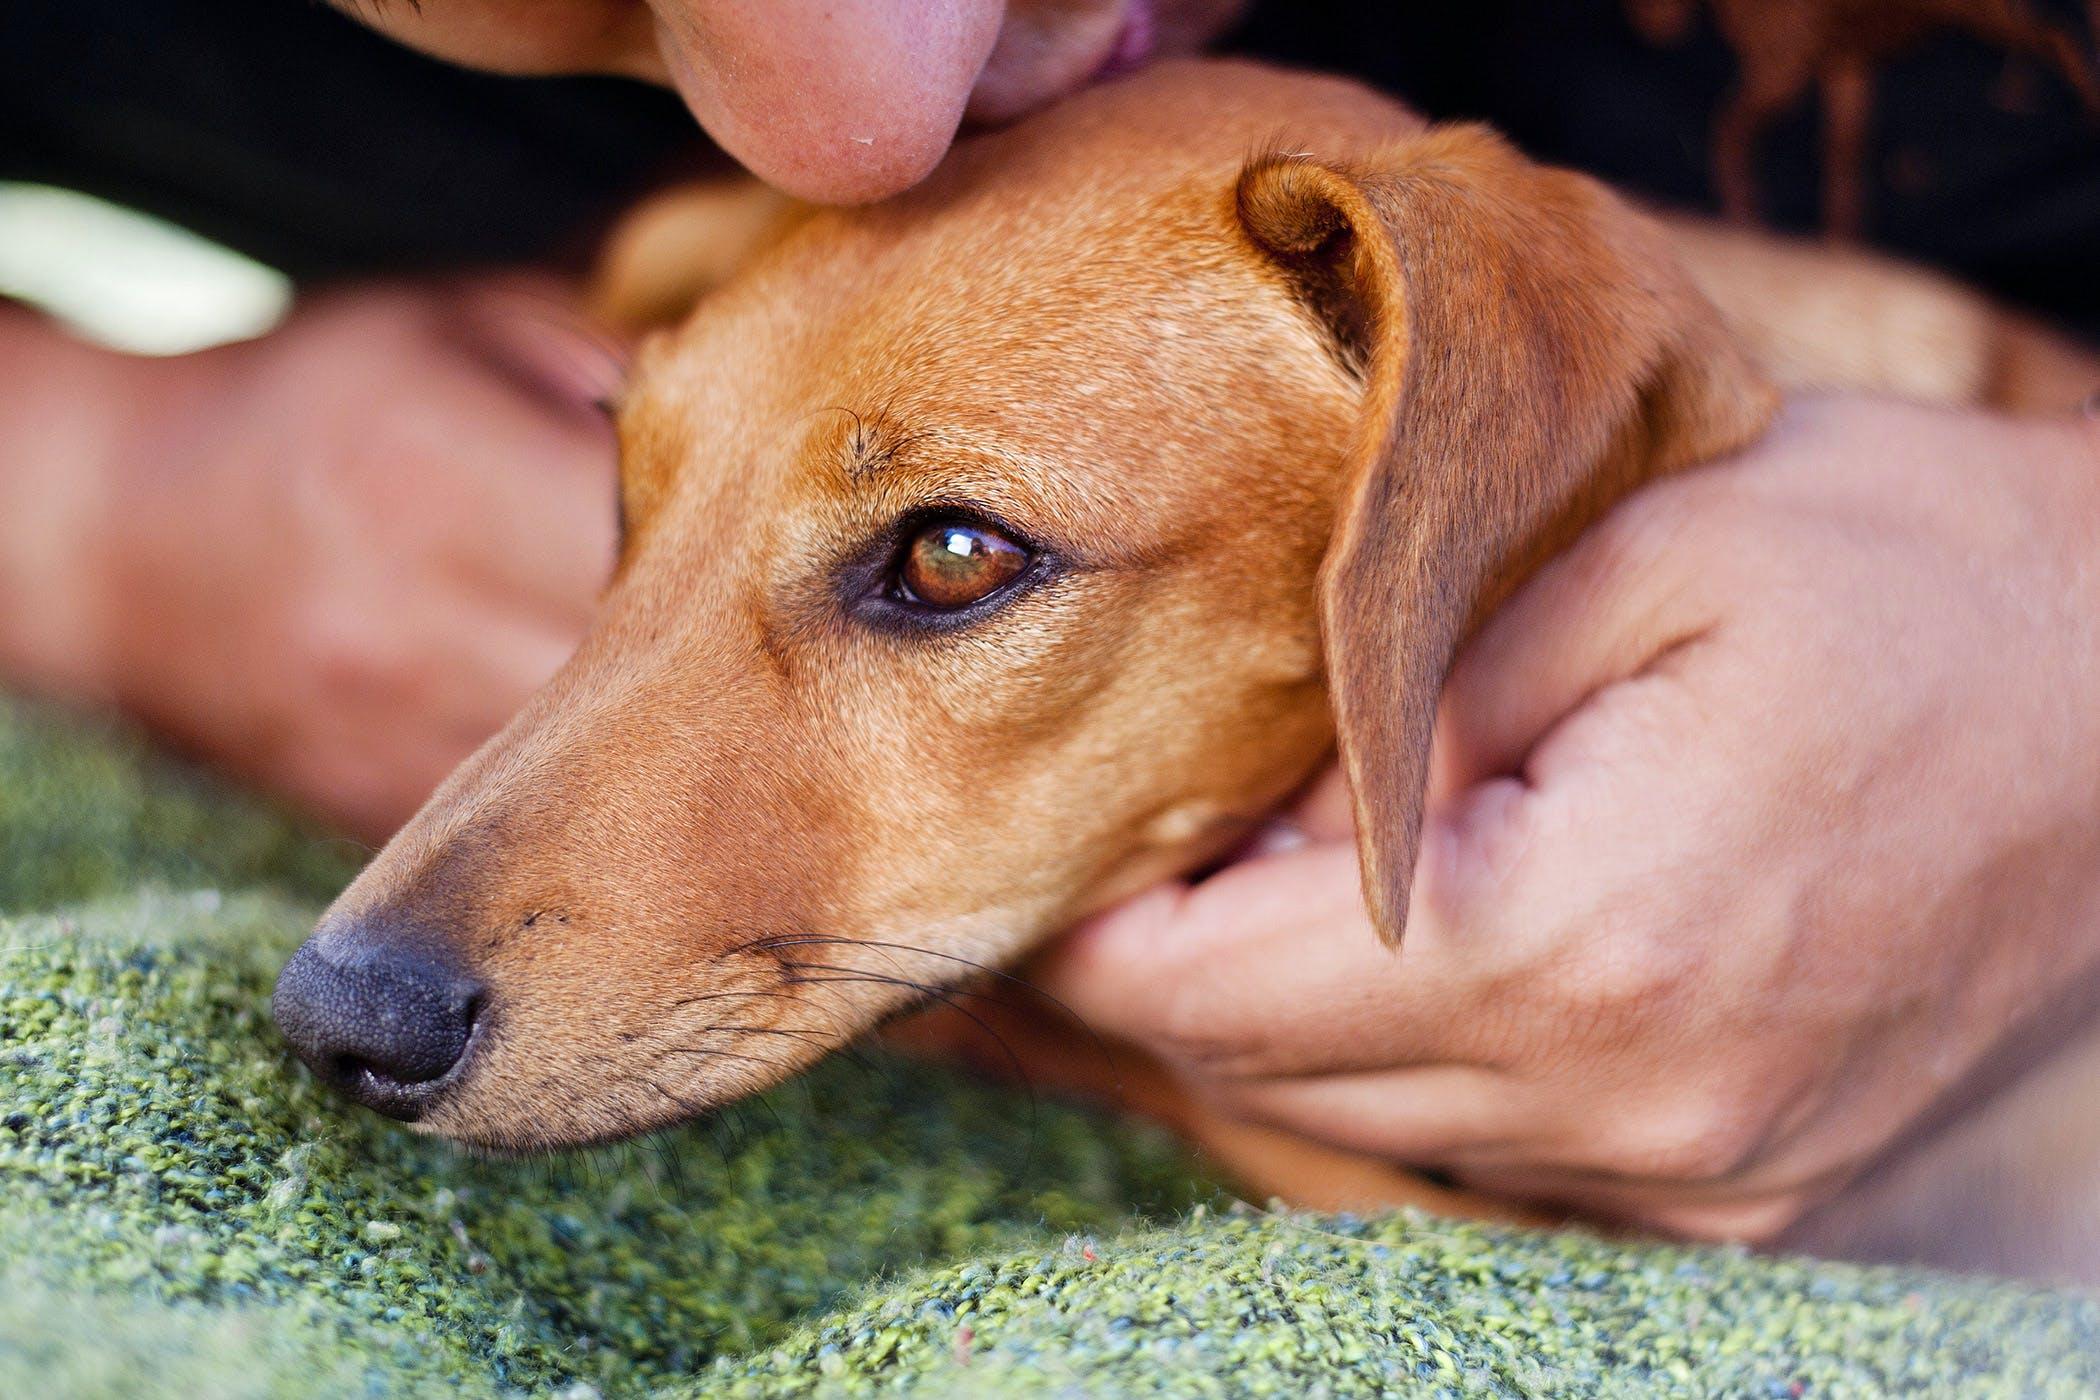 Aspiration Pneumonia in Dogs - Symptoms, Causes, Diagnosis